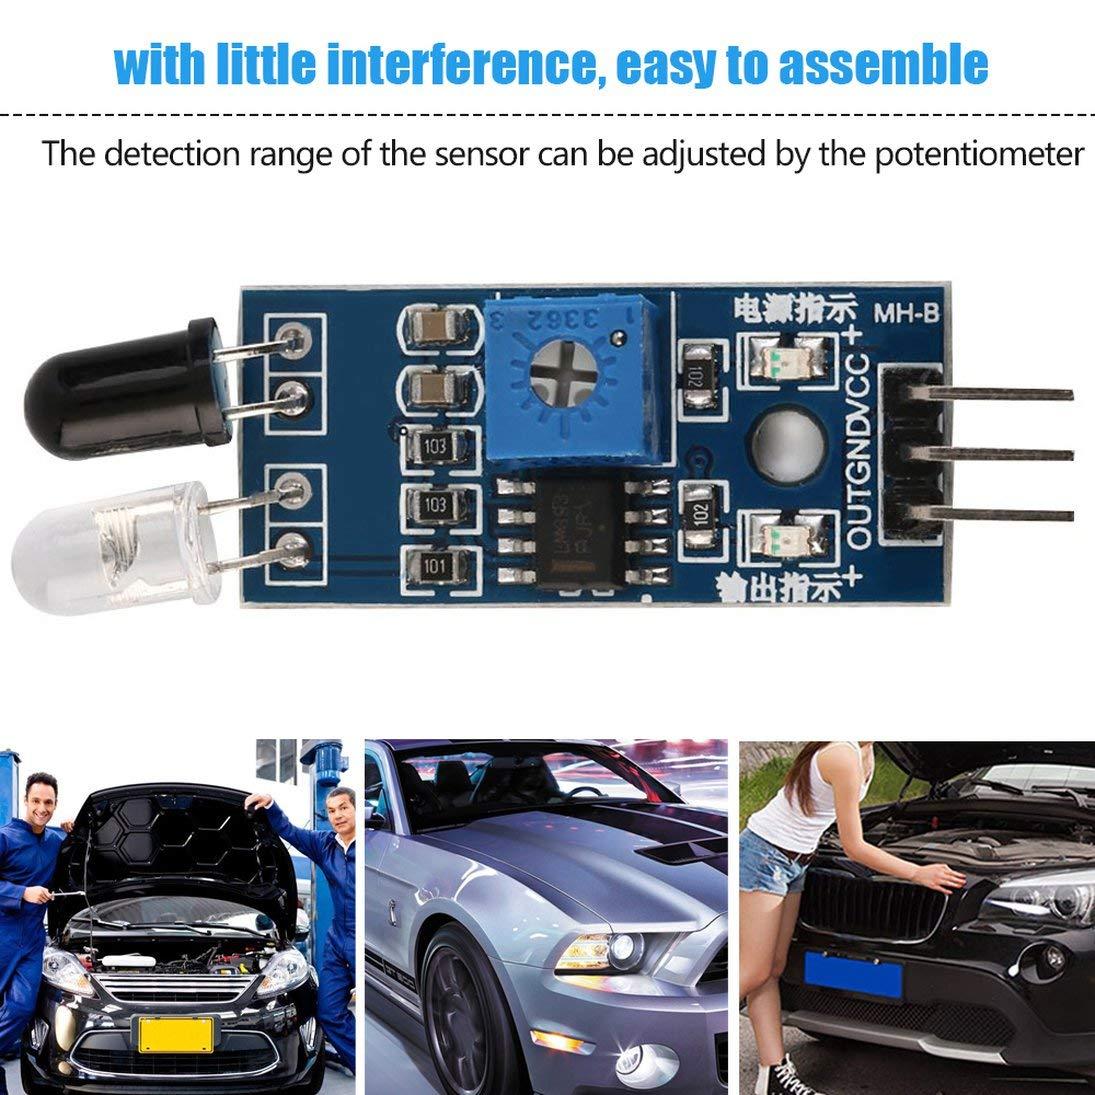 Super Deals 1Pc IR Sensor de evitaci/ón de obst/áculos por Infrarrojos para Arduino Smart Car Robot Mini tama/ño Peso Ligero ToGames-ES